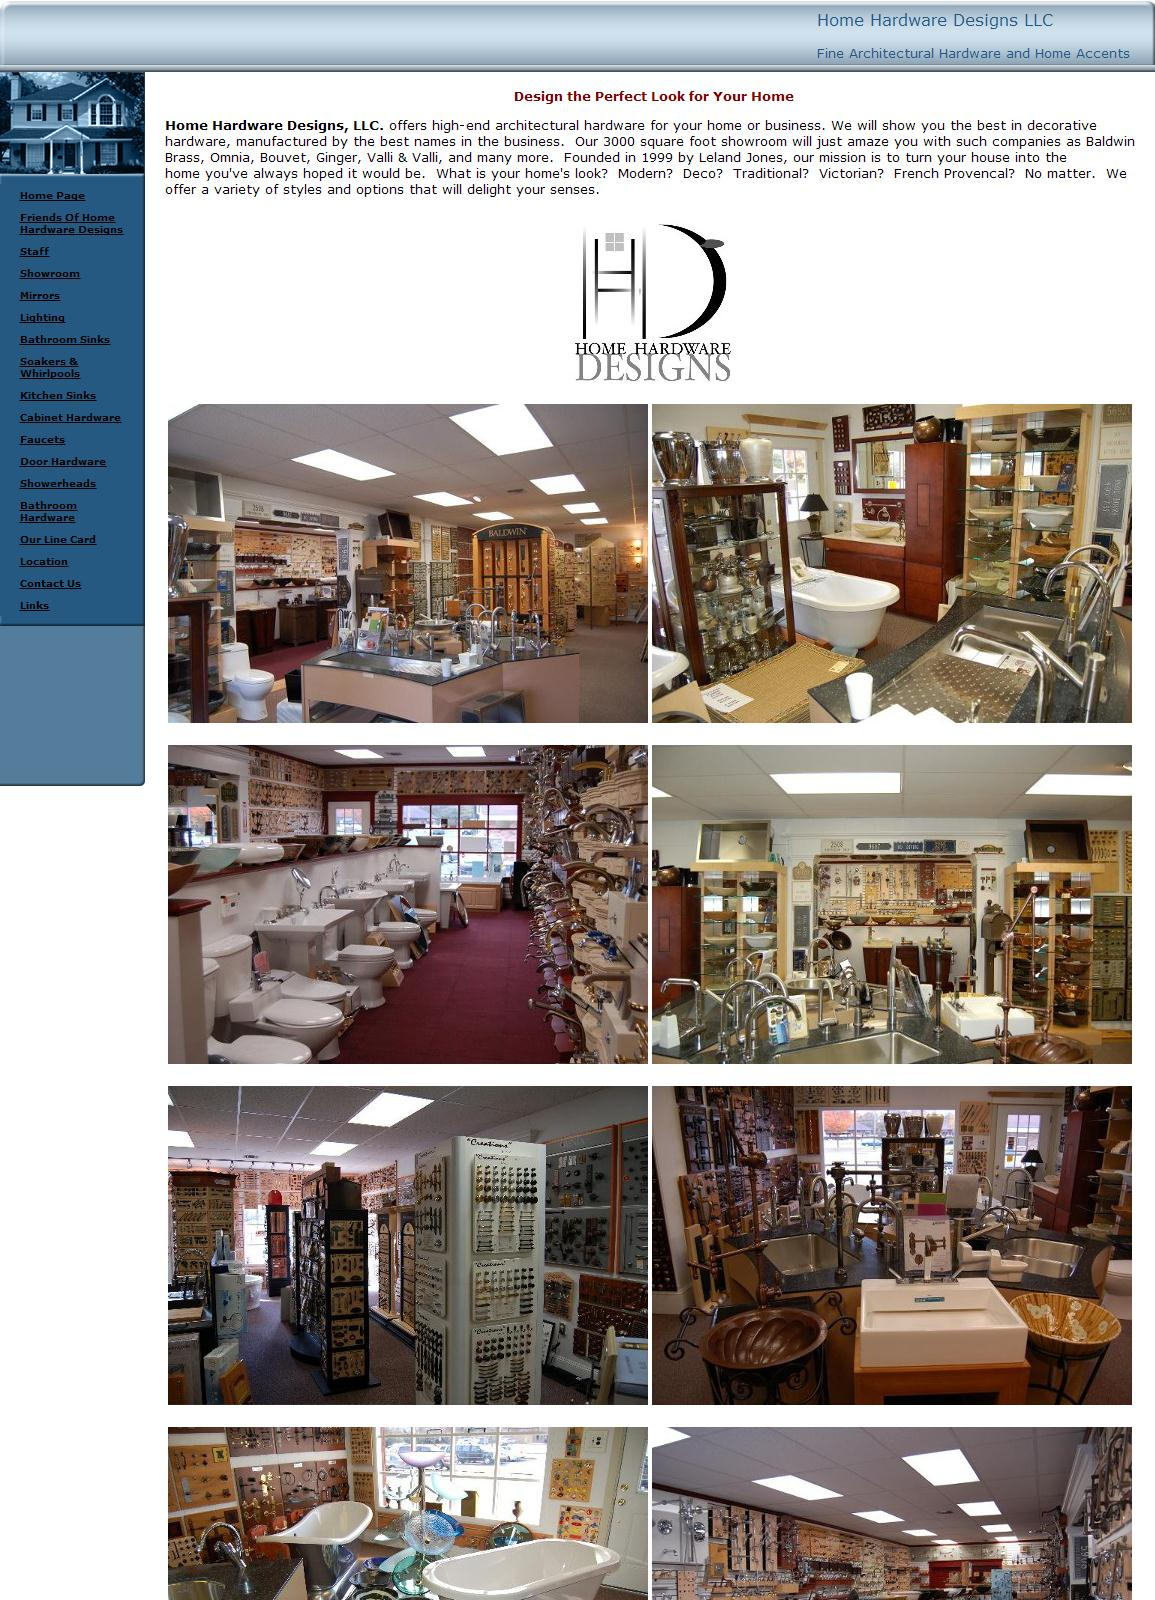 Home Hardware Design ~ Architectural Hardware Design ~ West Trenton, New  Jersey